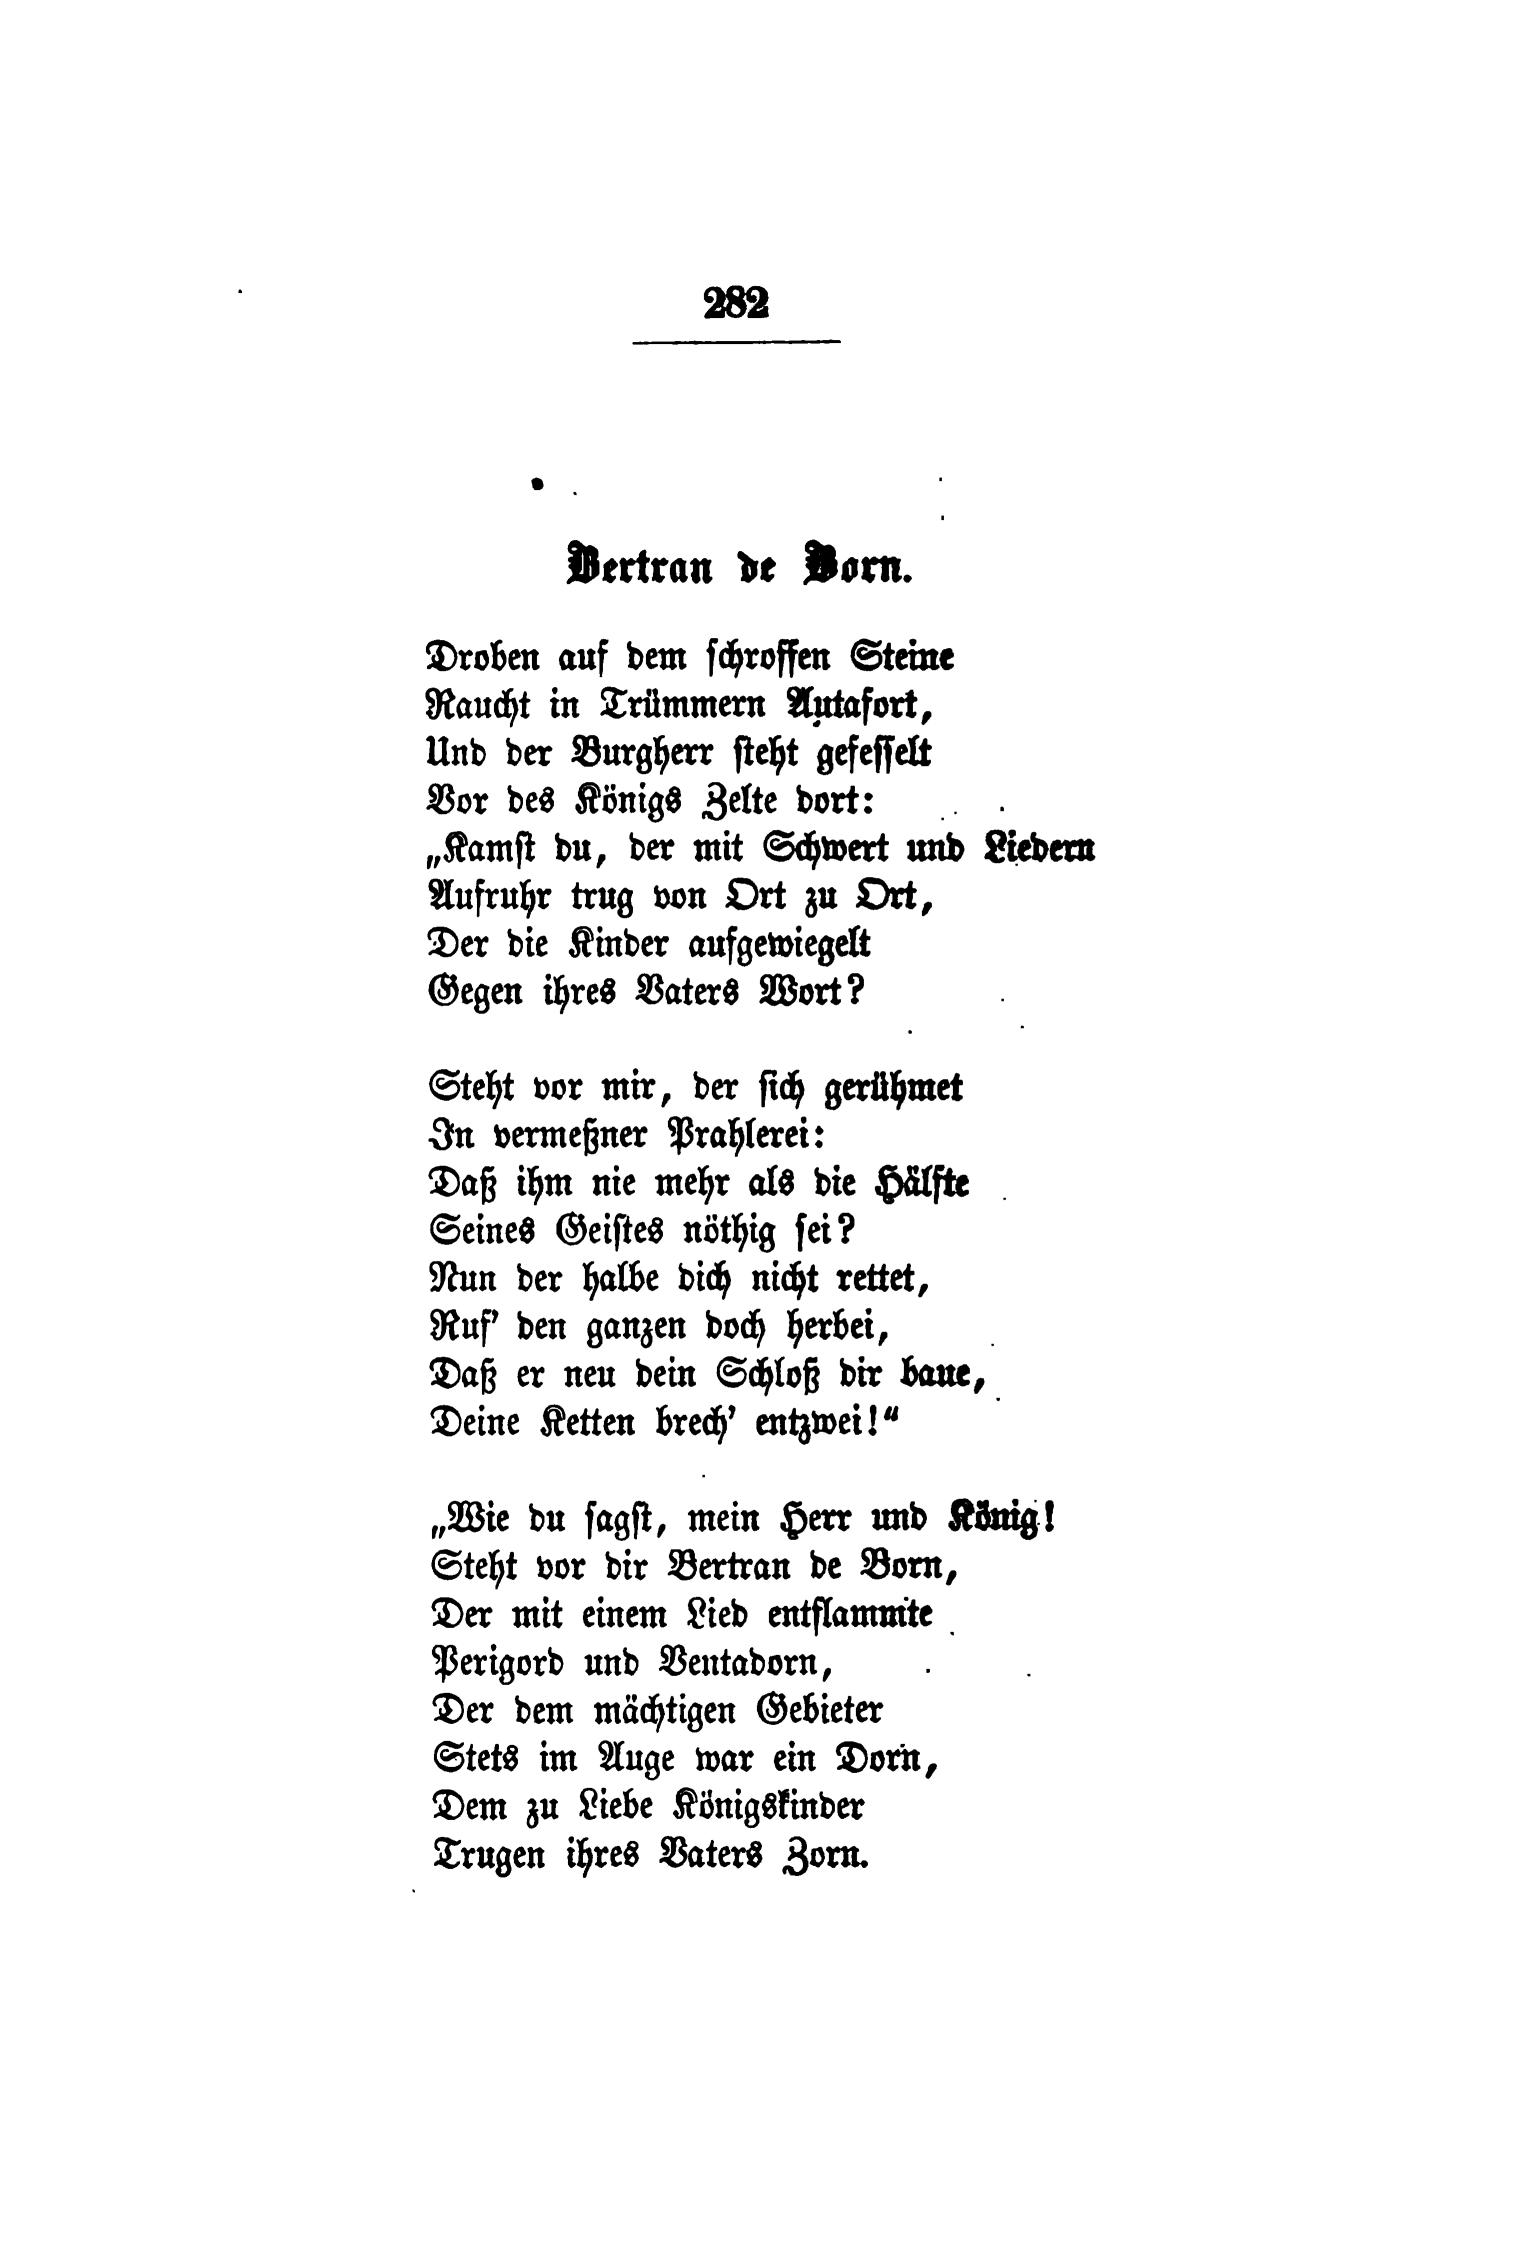 File:De Gedichte (Uhland) 300.jpg - Wikimedia Commons